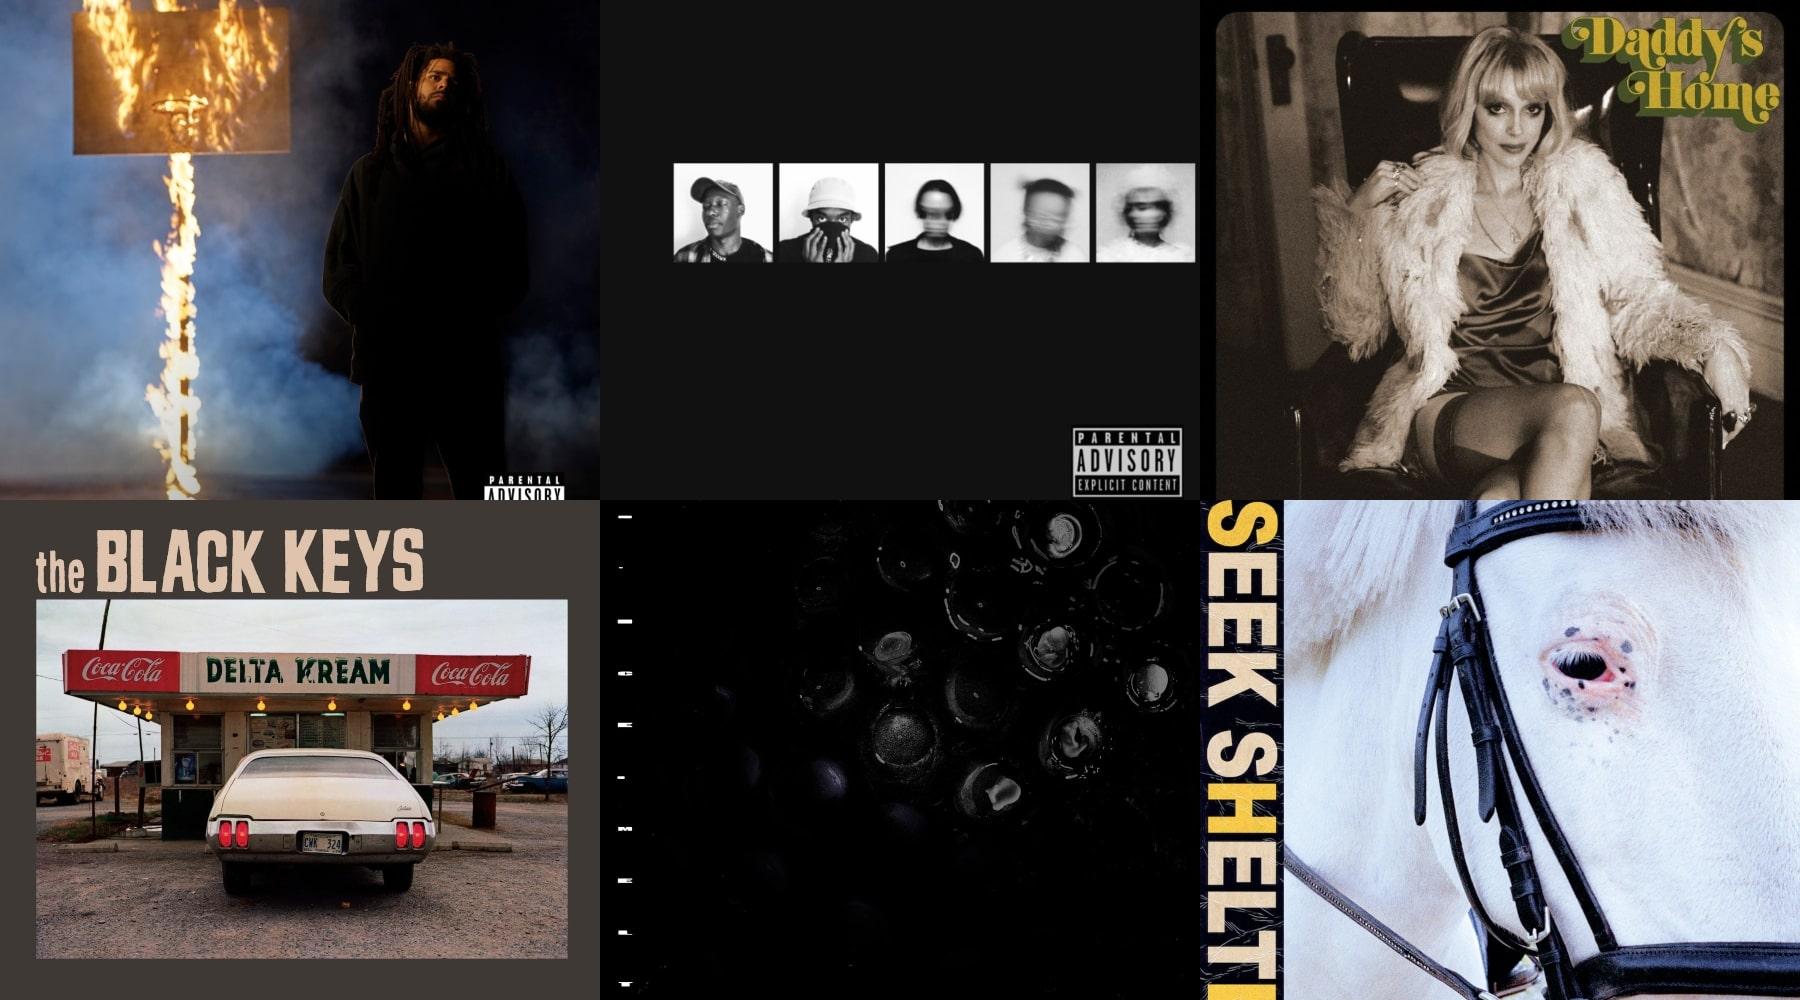 6 nuevos albums que debes escuchar esta semana